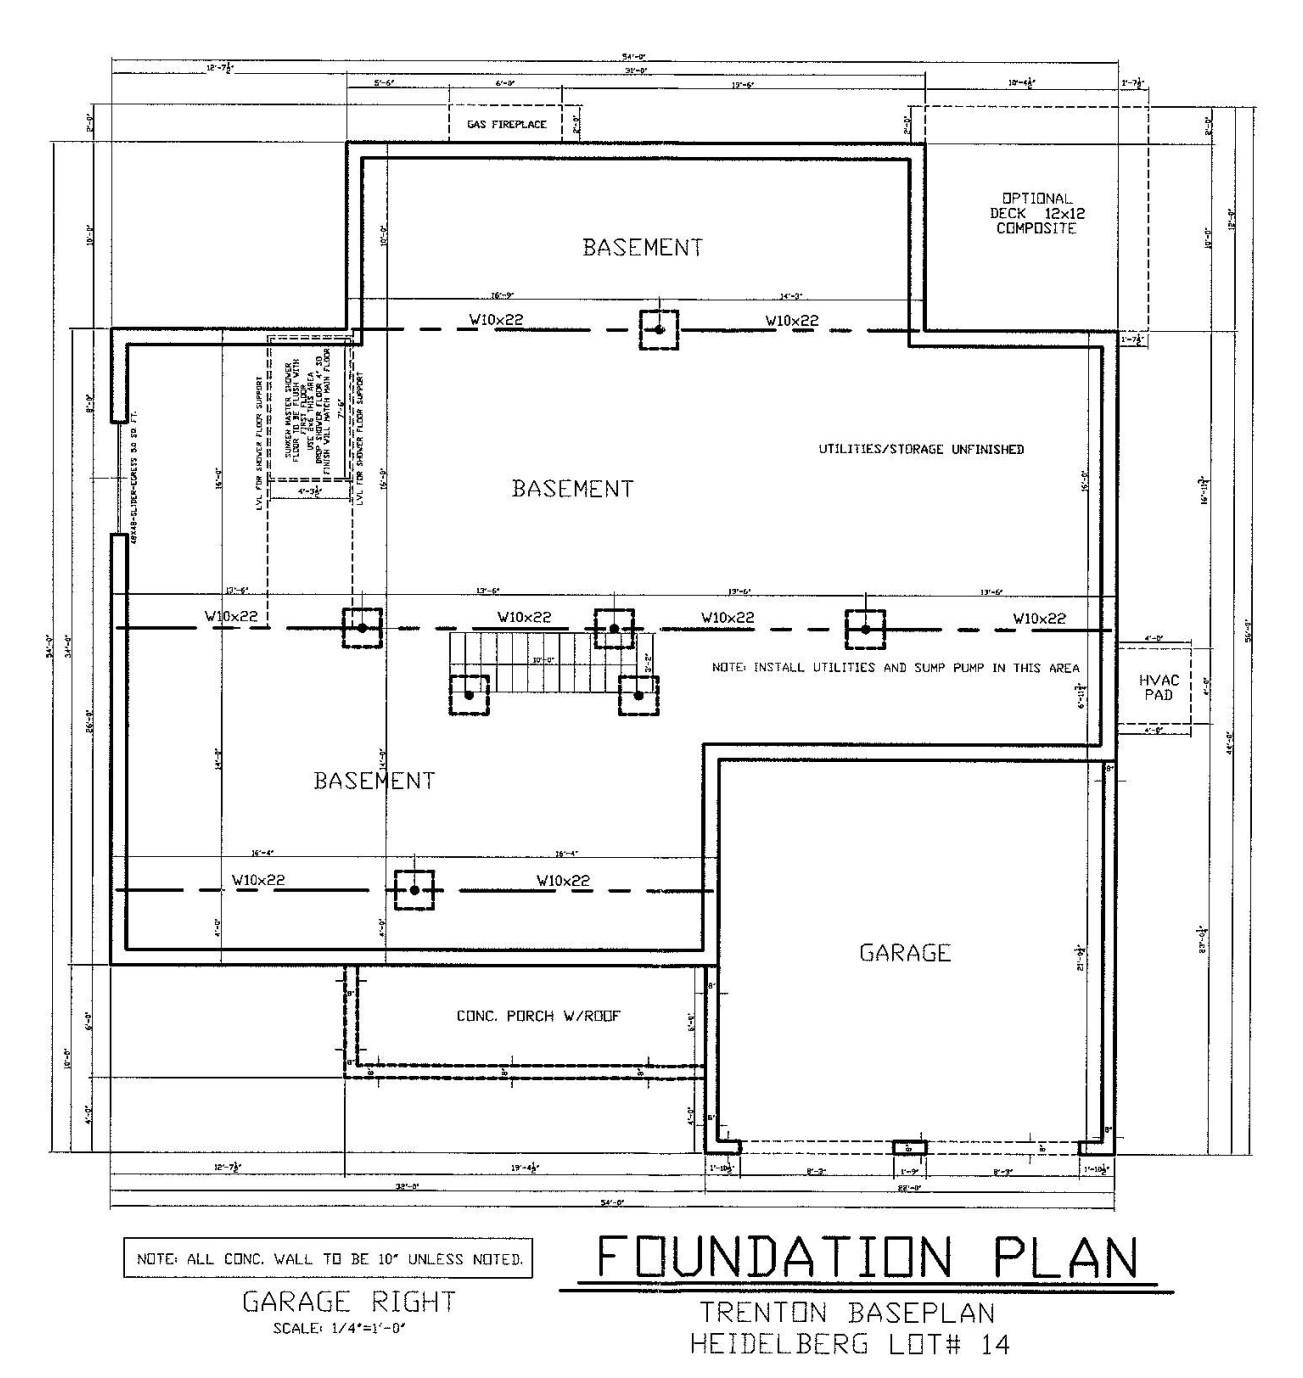 Foundation Plan